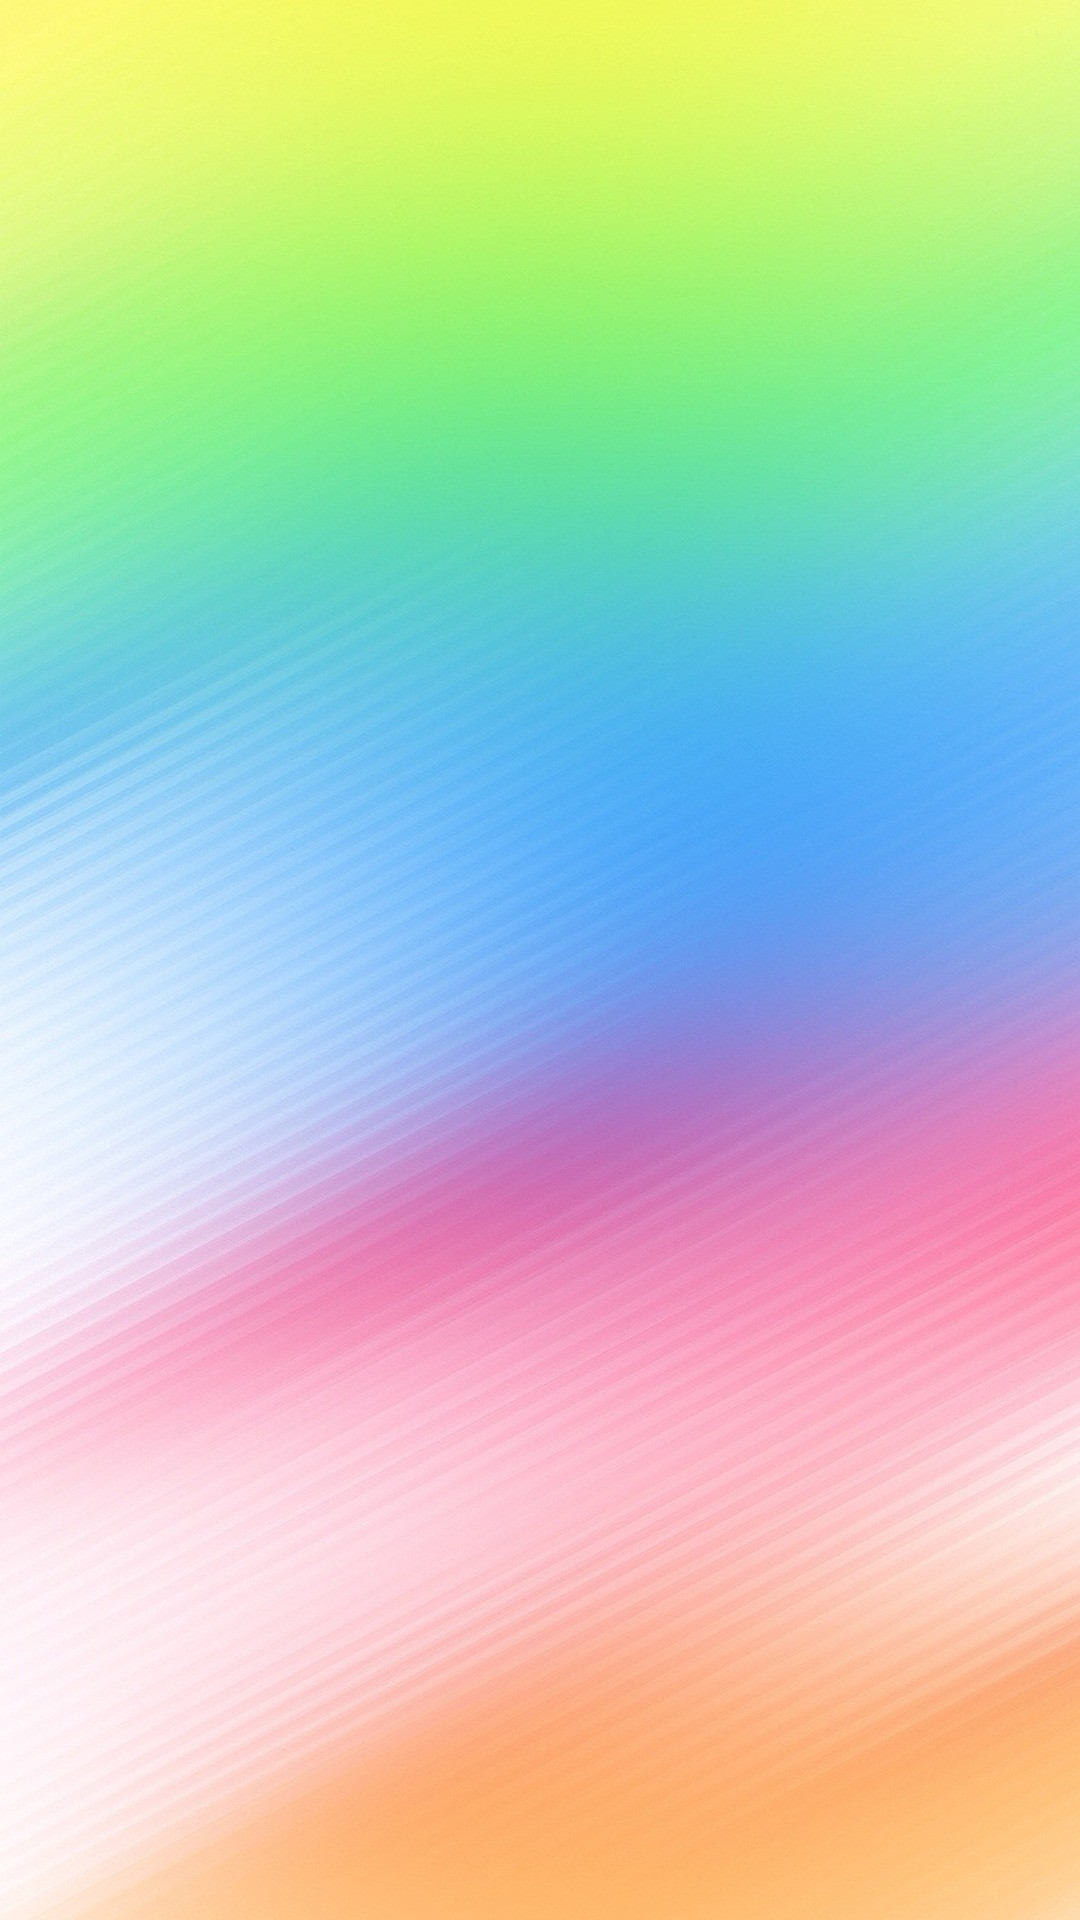 Cydia Animated Wallpaper Ios Dynamic Wallpaper 66 Images